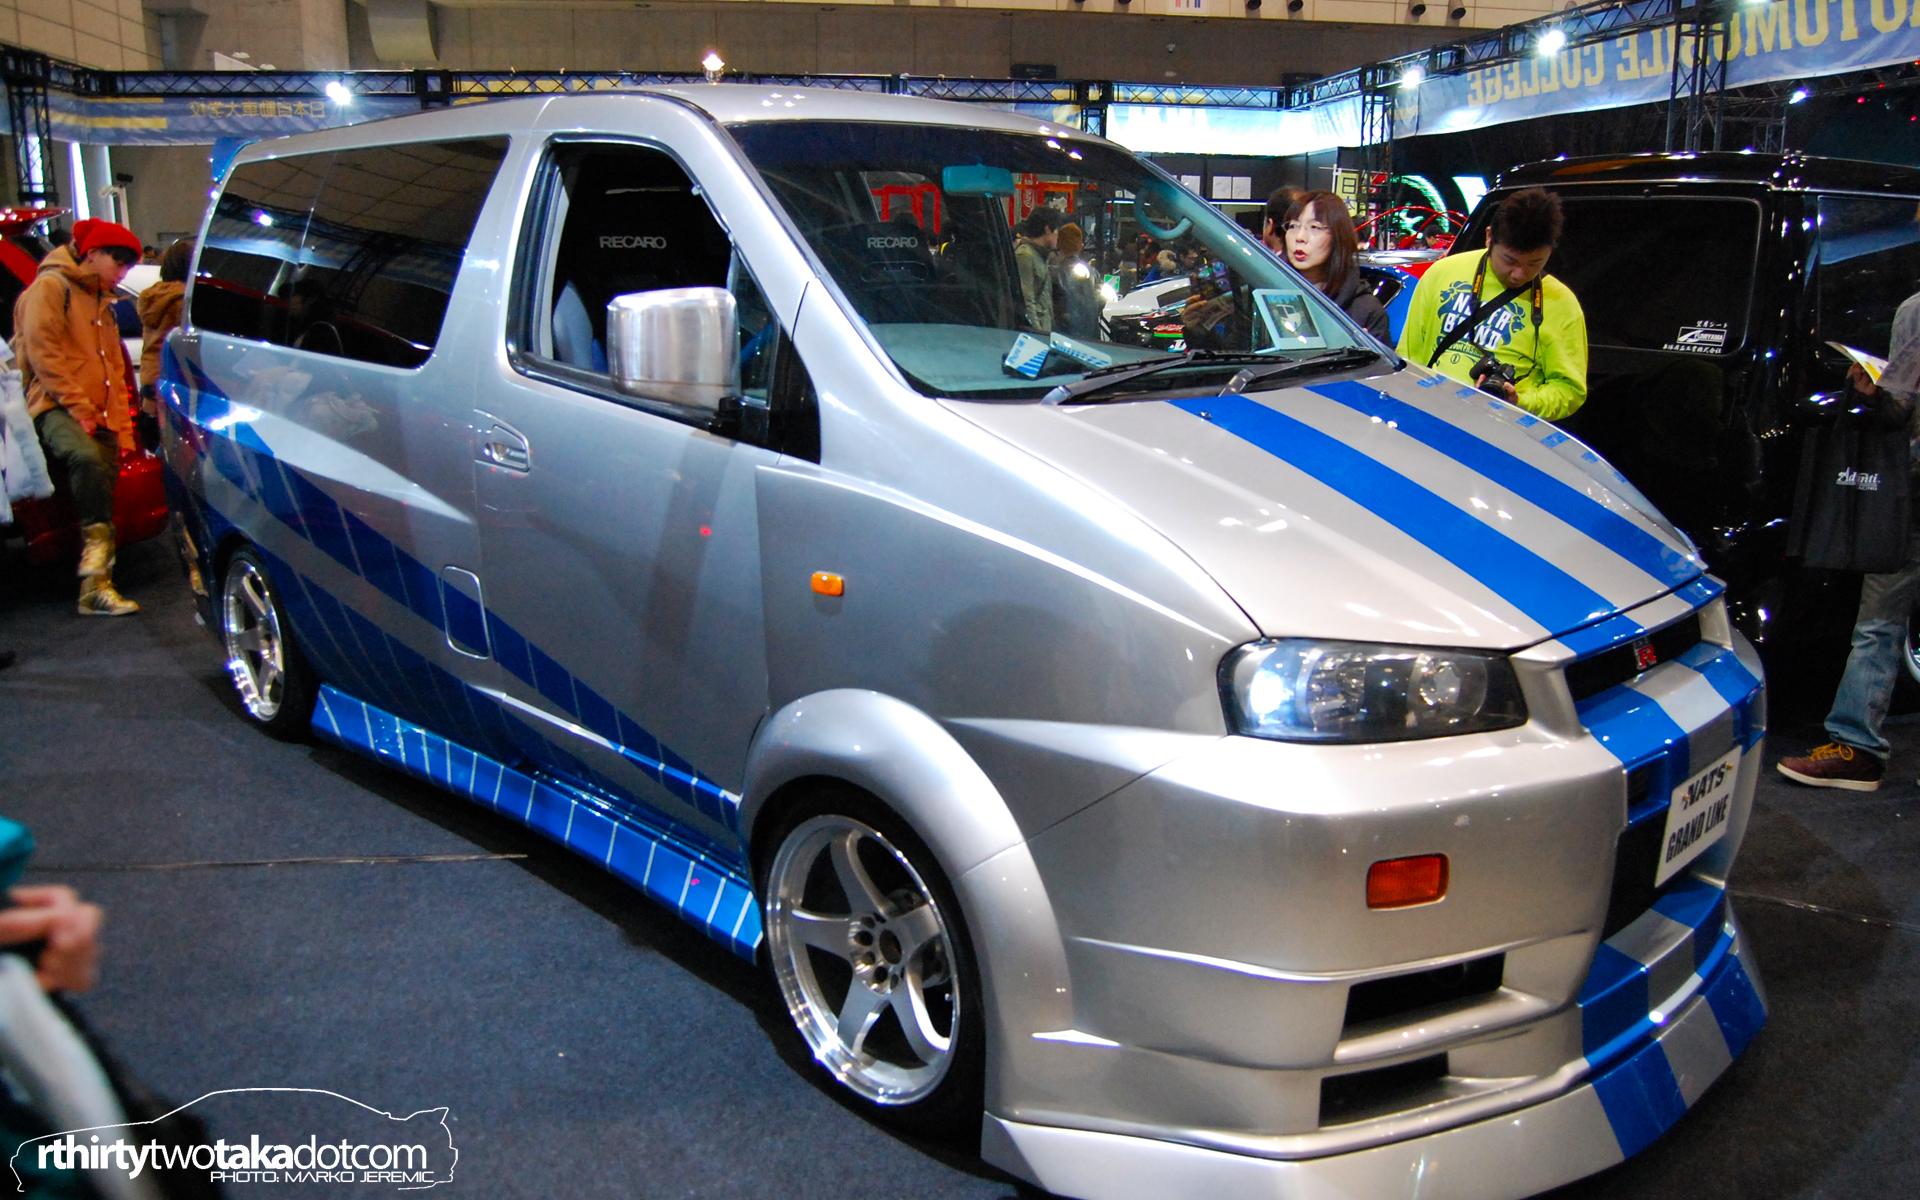 Tokyo auto salon 2013 part iii r32taka com for 2013 tokyo auto salon